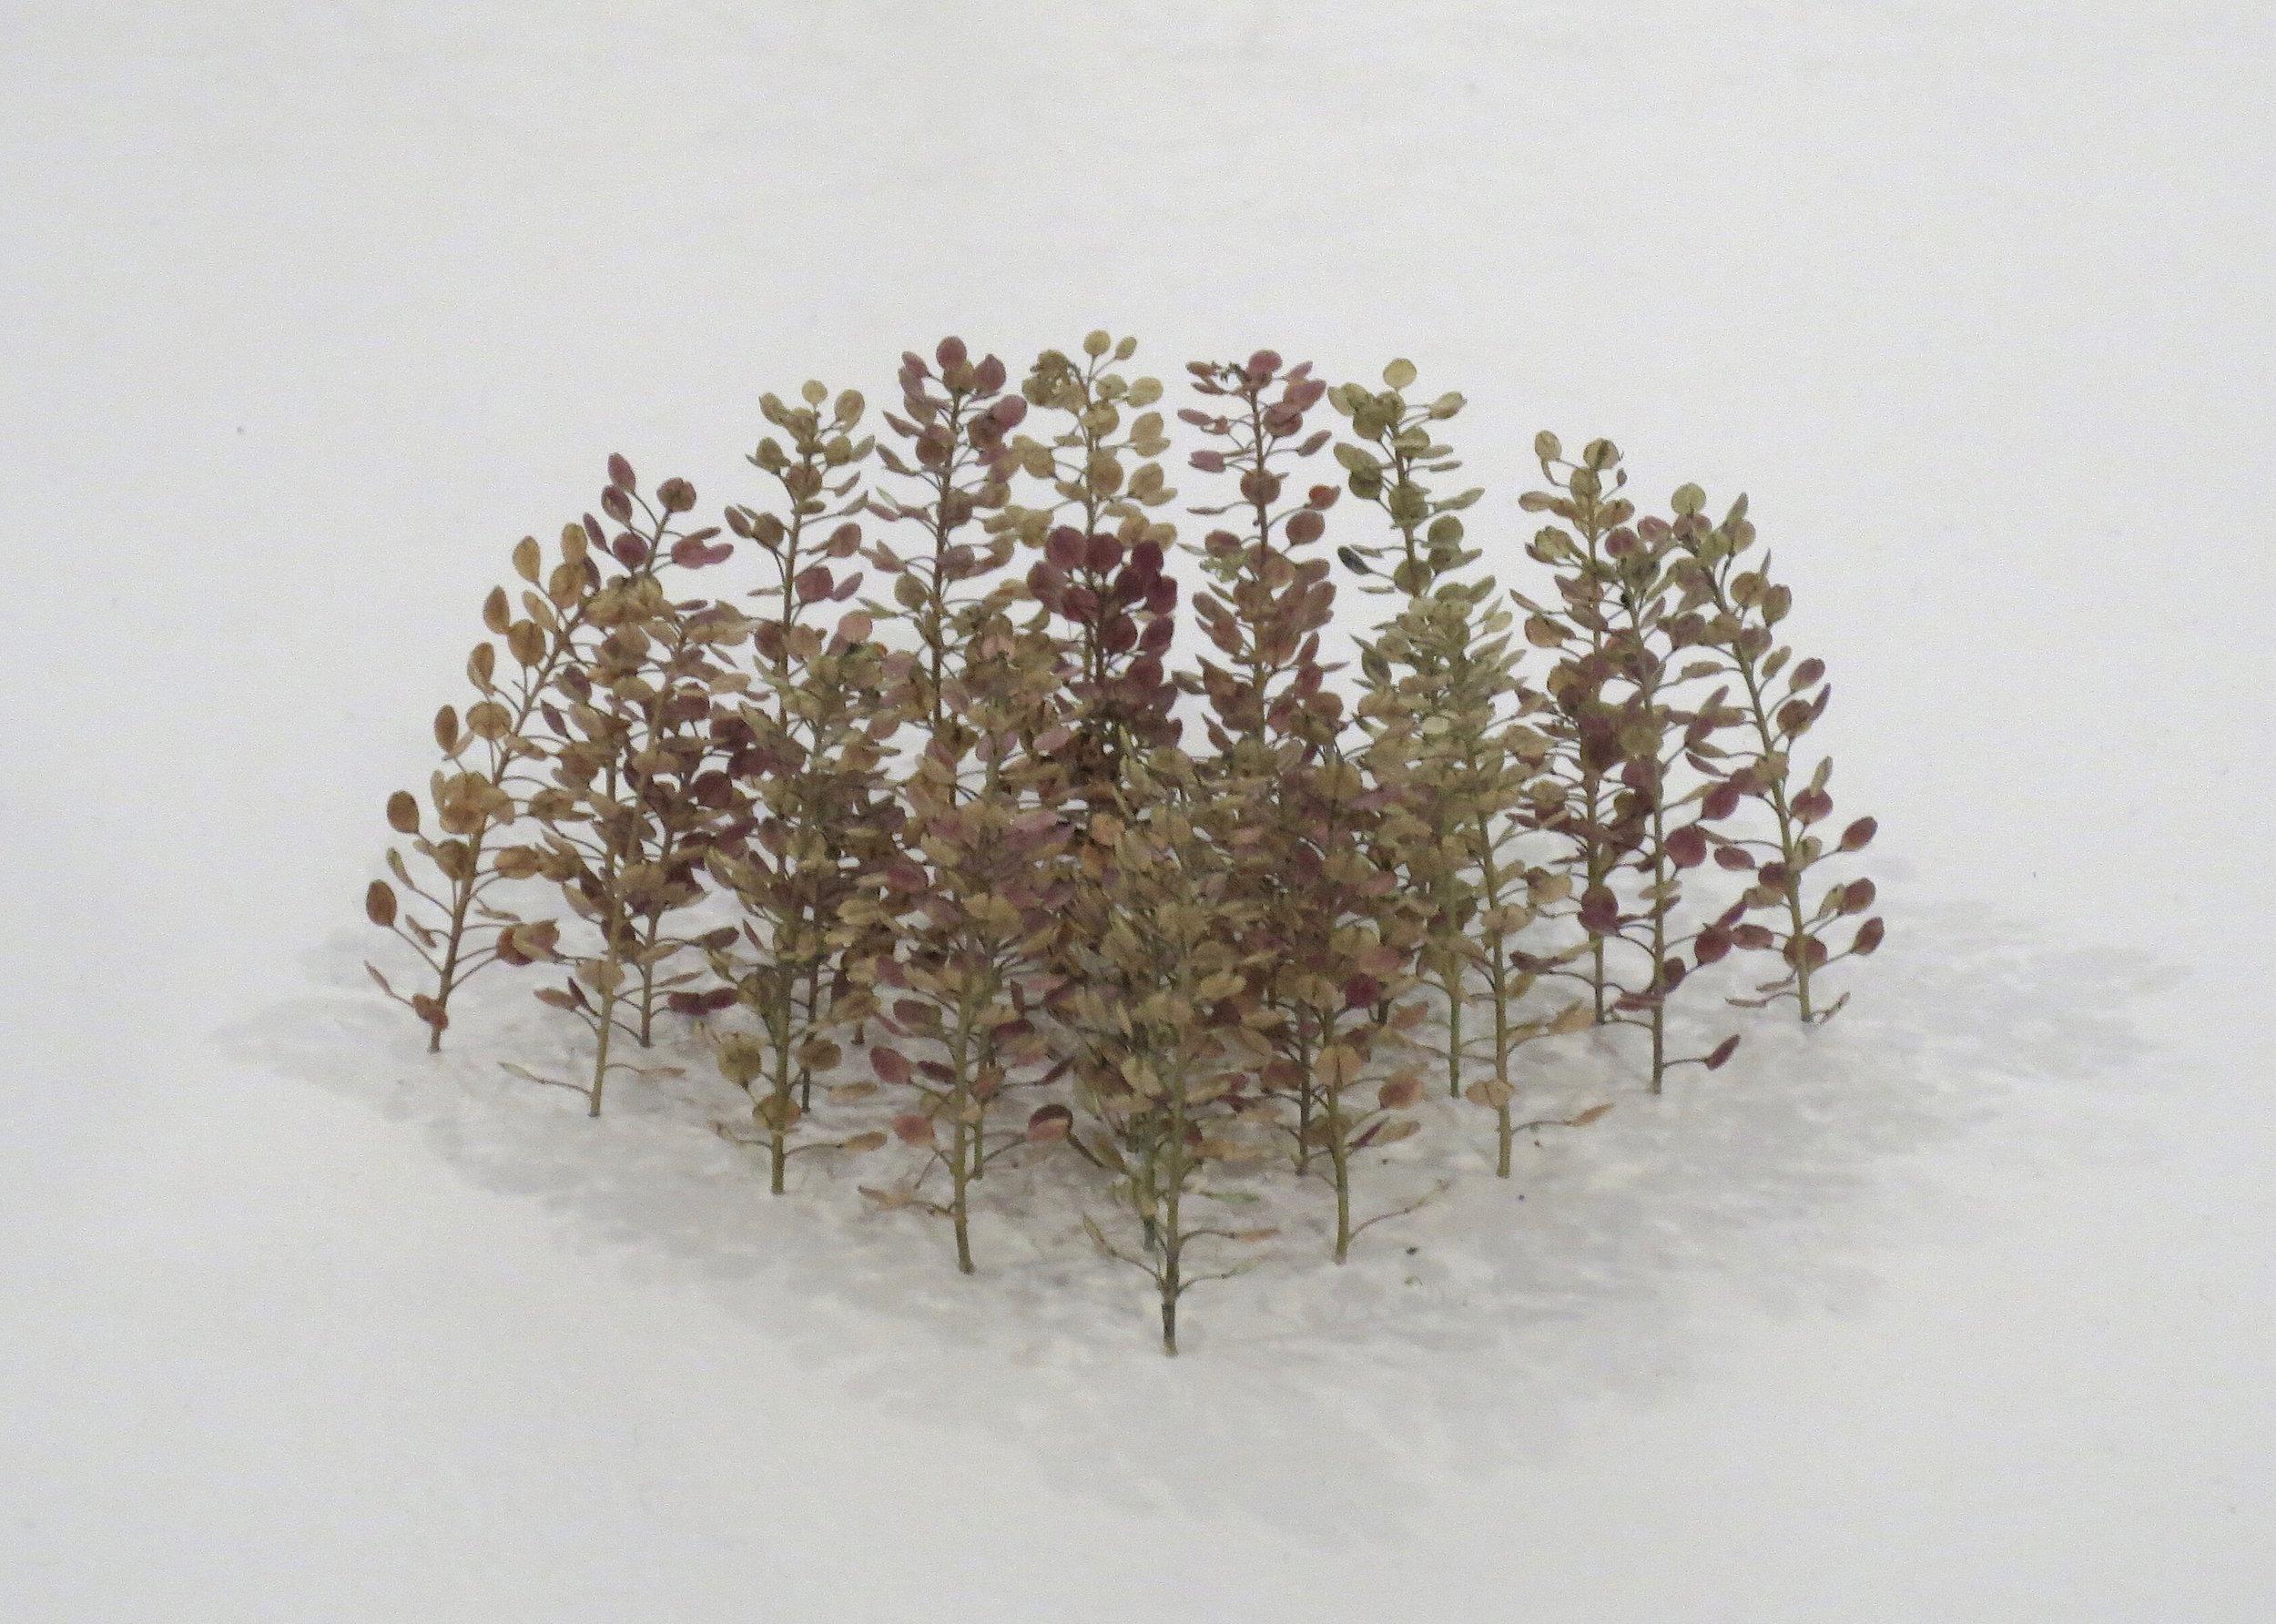 Christiane Löhr  (B. 1965)  Concave Form/Cube [Konkave Form/Quadrat] , 2018 Plant stalks 13 3/4 x 3 1/8 x 3 1/8 inches 3,5 x 8 x 8 cm